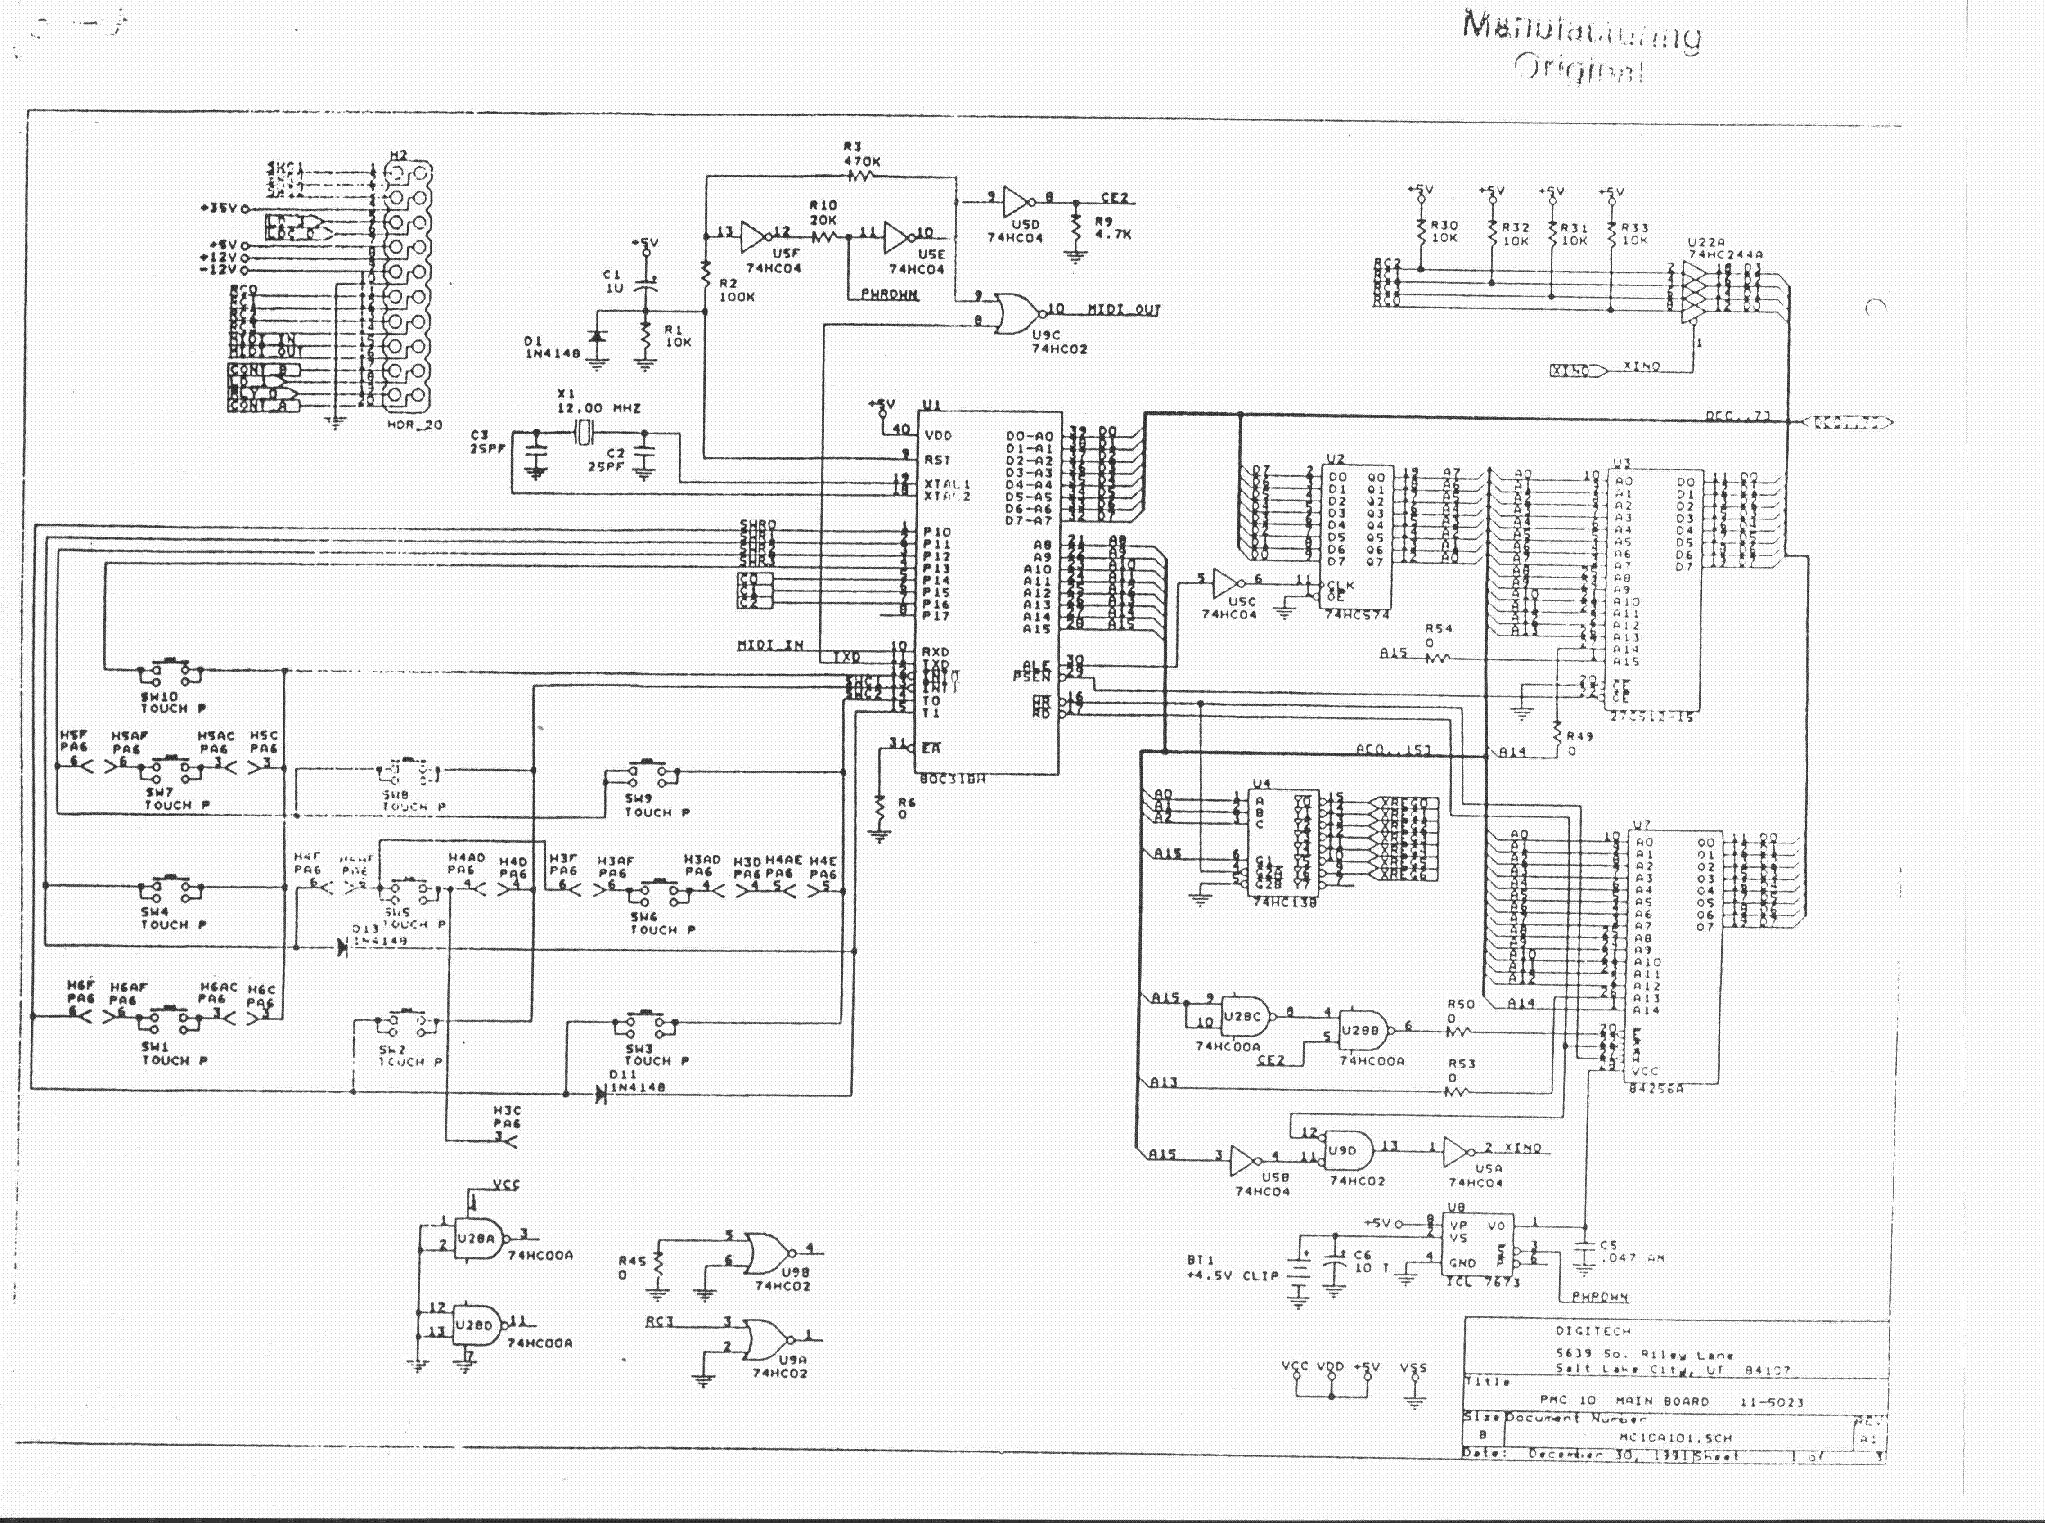 DIGITECH PMC10 MIDI CONTROLLER SCH Service Manual download